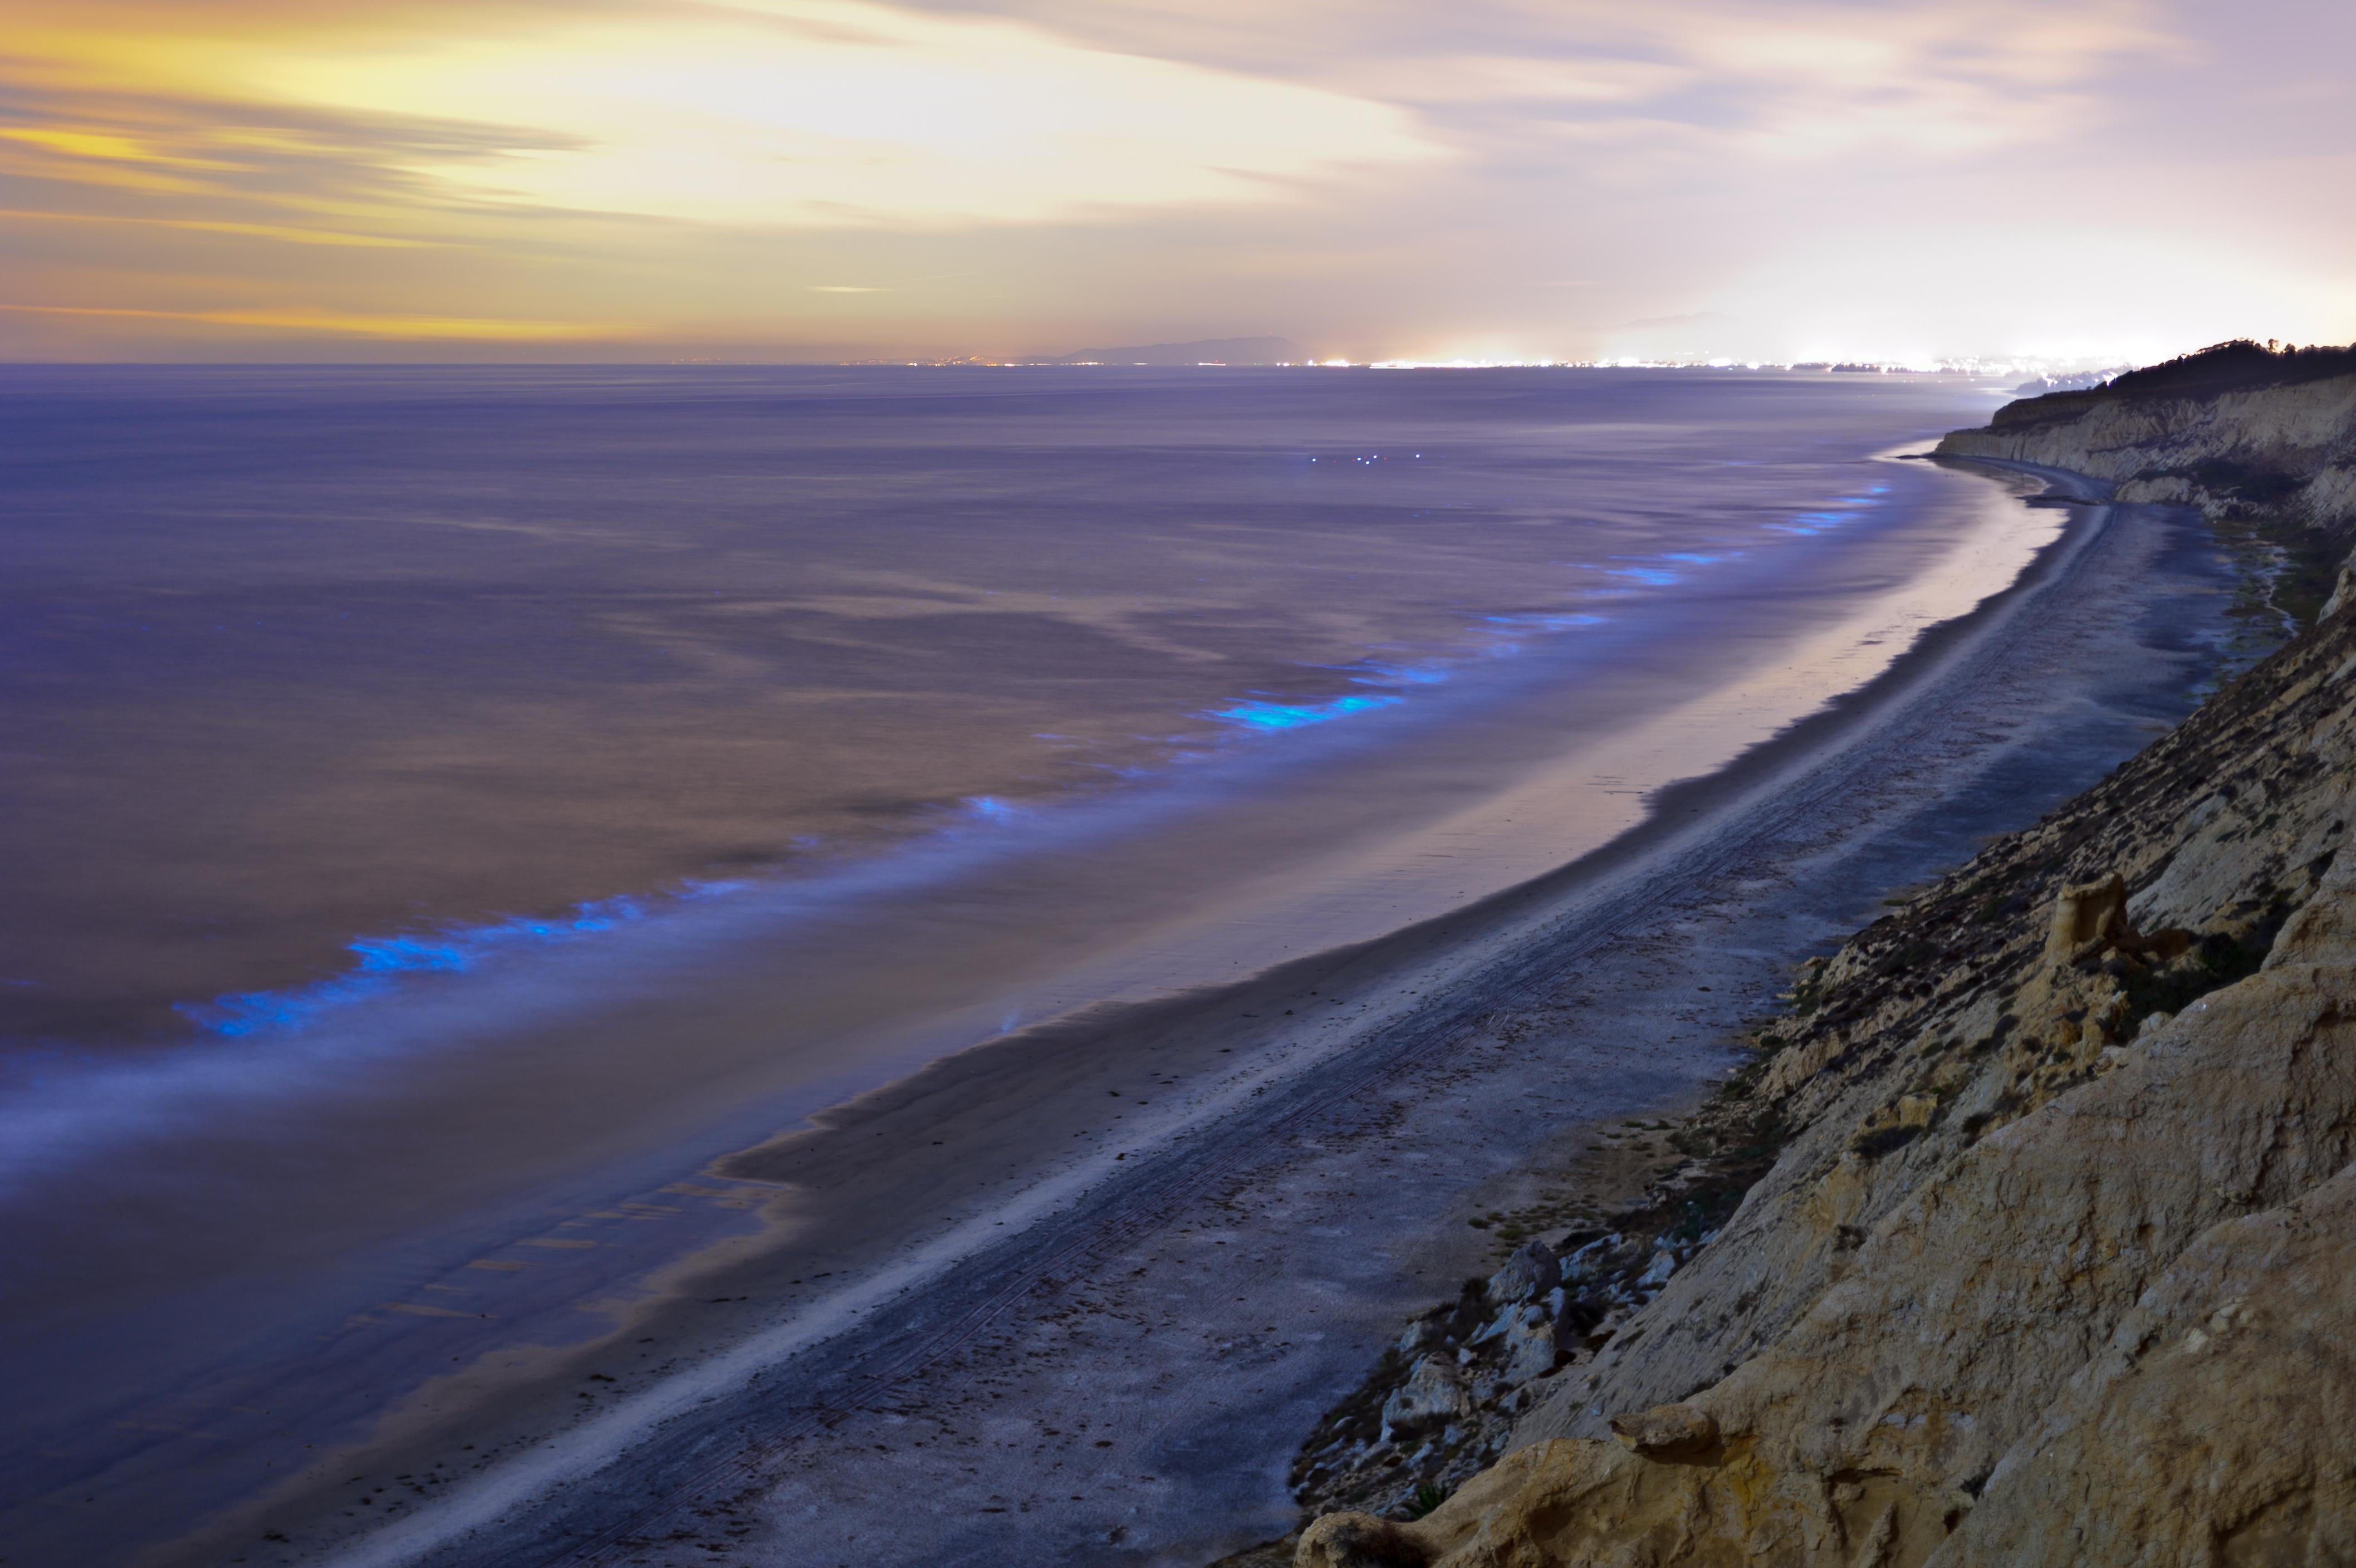 Coast of Torrey Pines State Beach, San Diego.